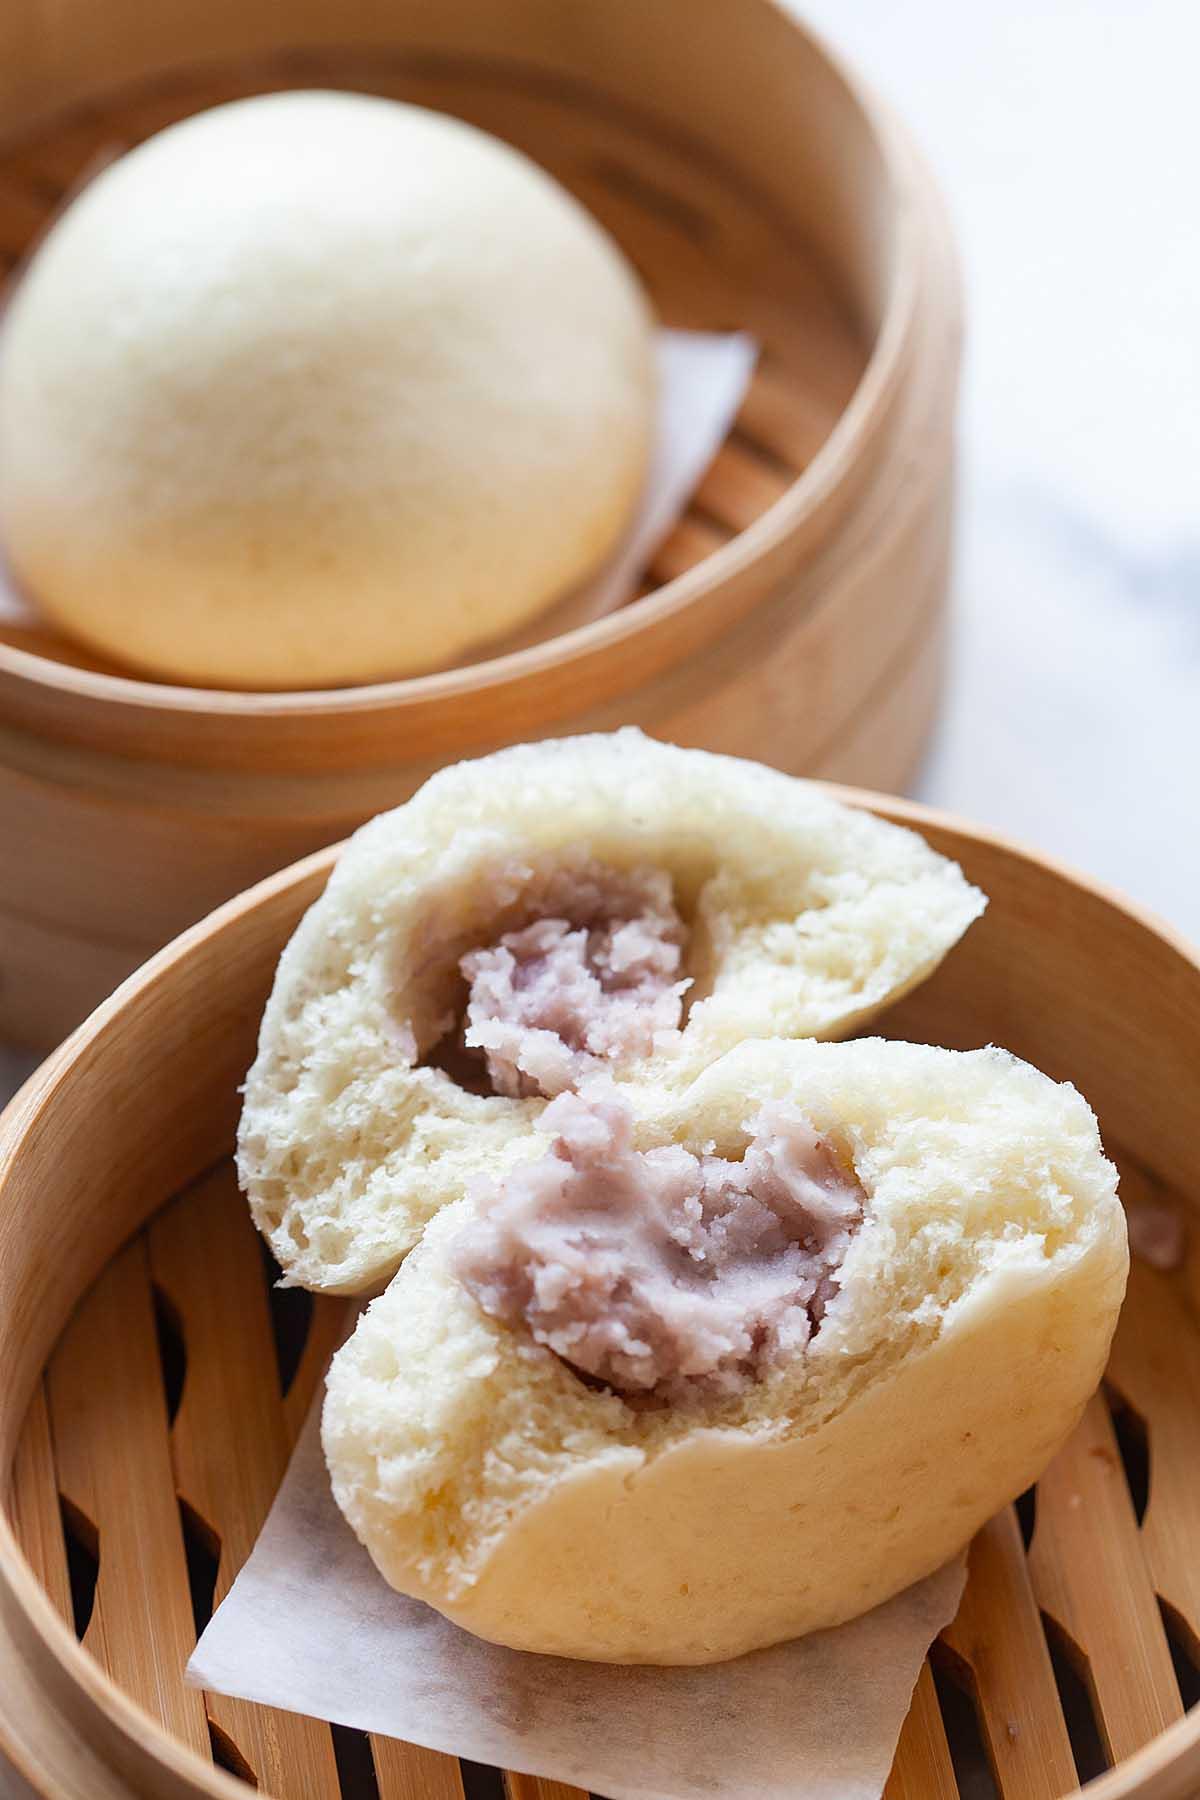 Chinese sweet taro bun with taro paste inside the bun.